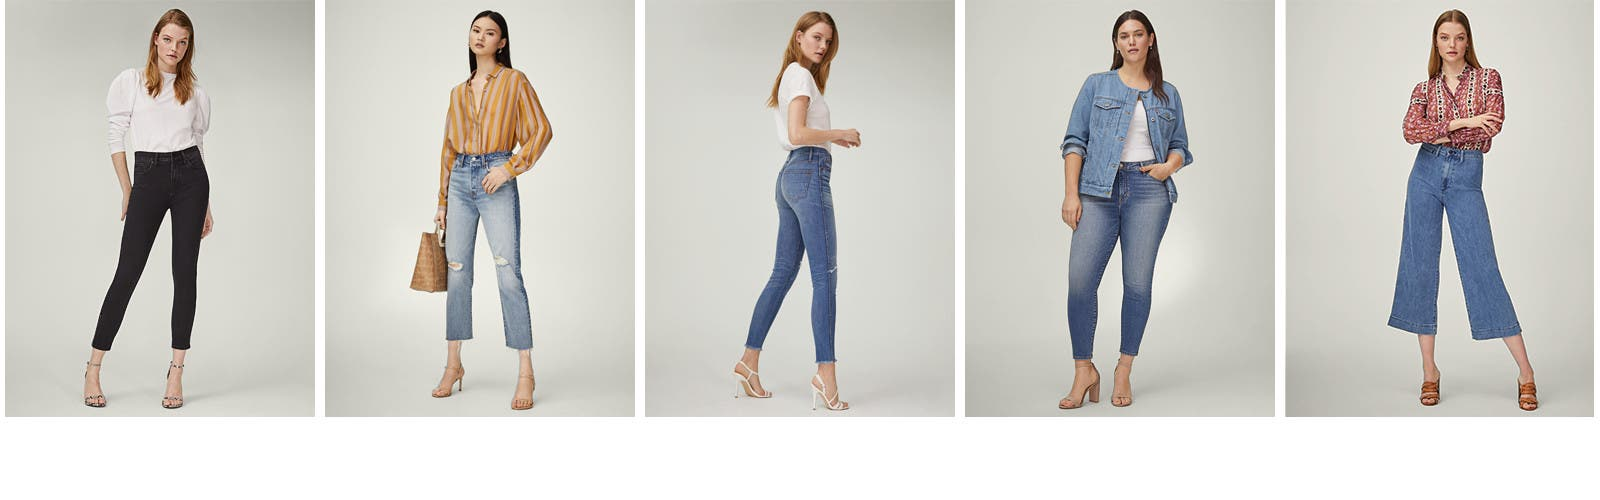 Womens's Jeans & Denim.